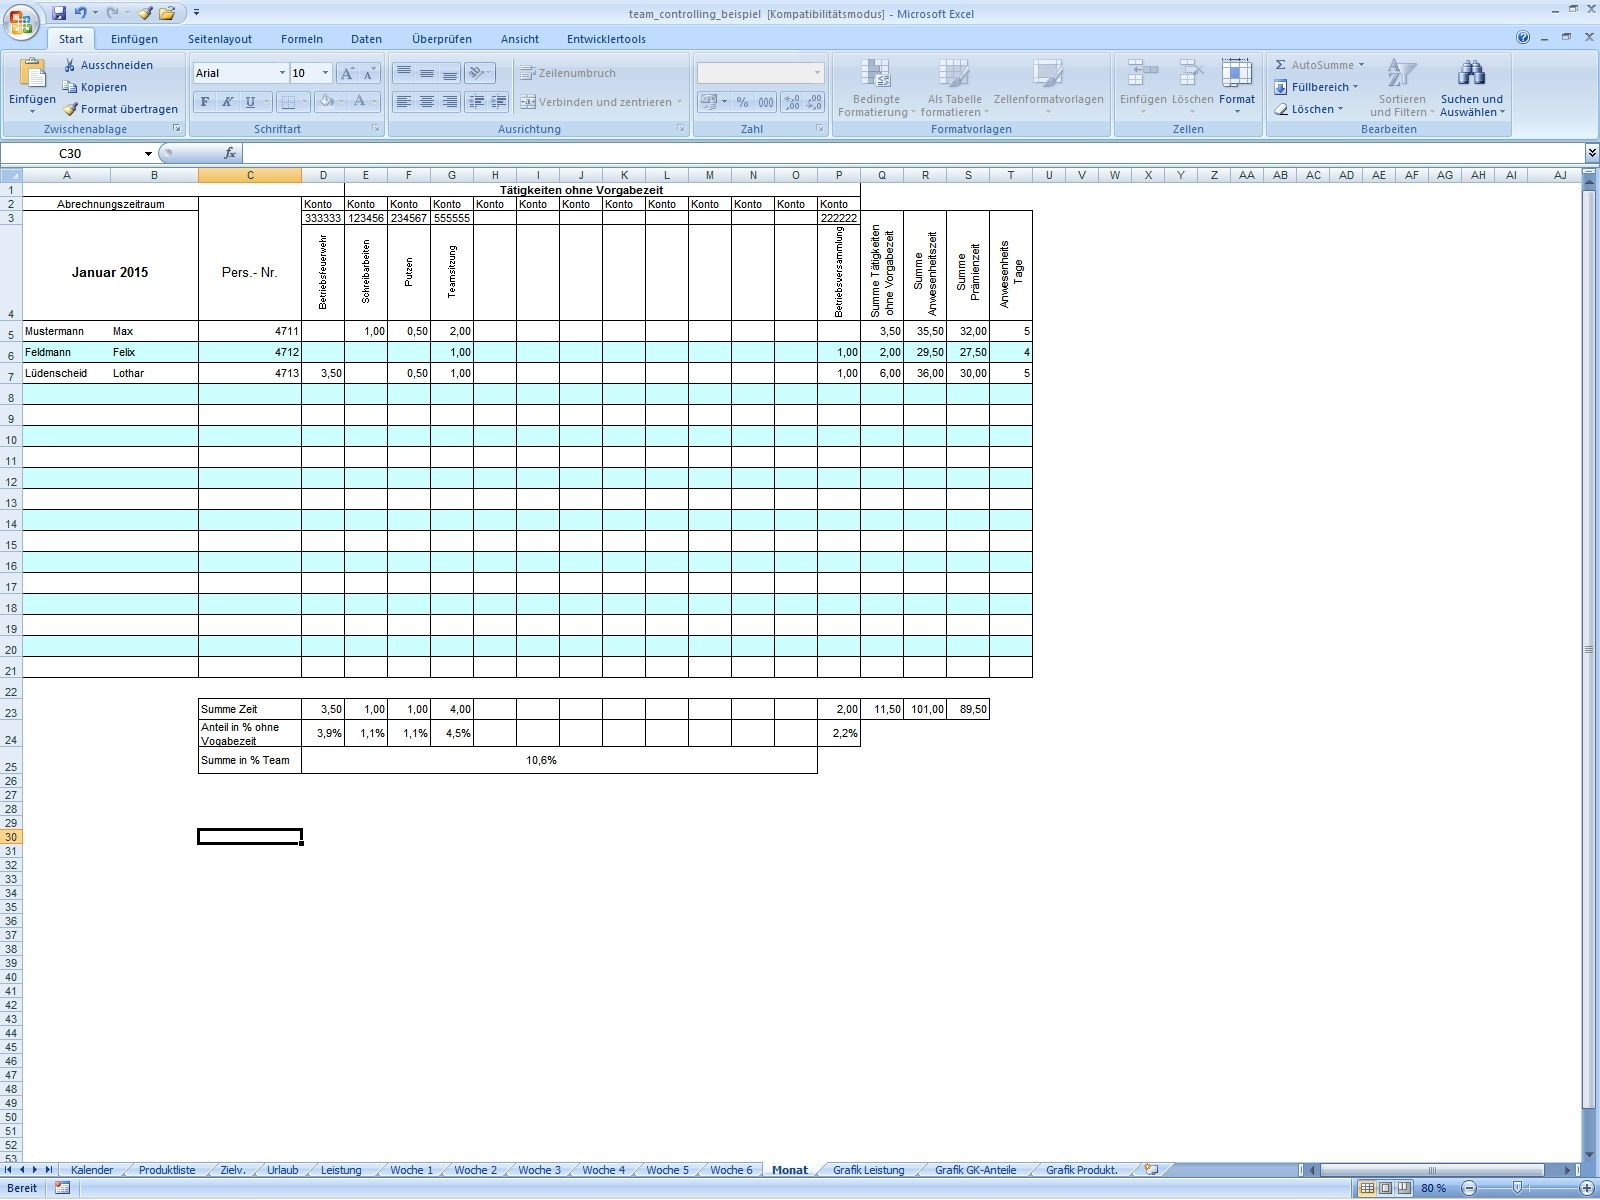 Excel-Vorlage: Team-Controlling